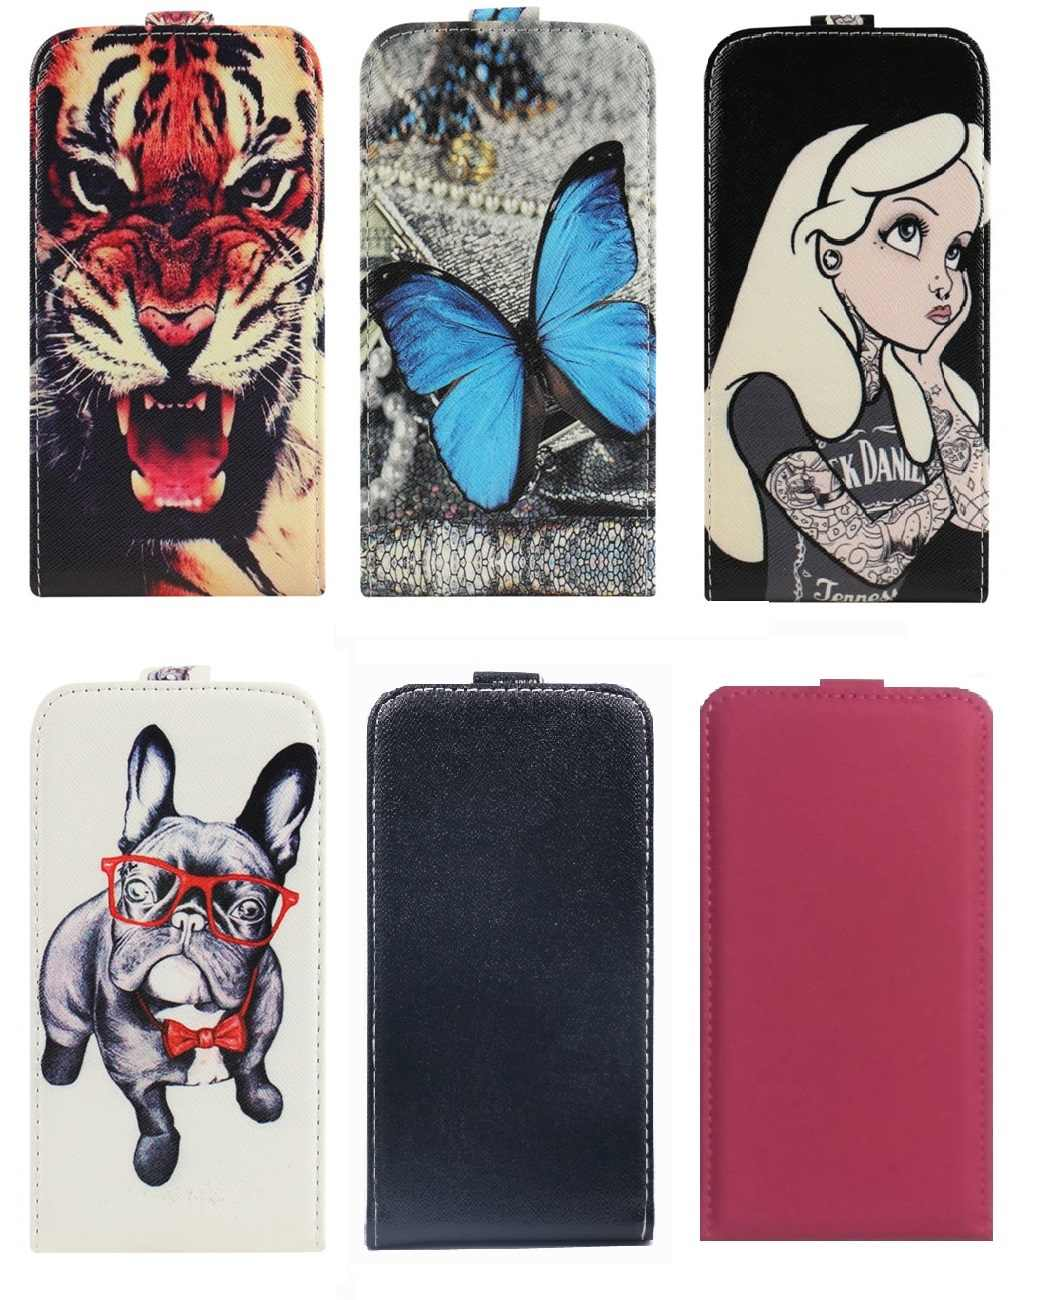 Yooyour Cover cover Fashion fashion printed case for Fly FS401 FS402 FS403 FS404 FS405 FS406 FS407 Stratus 1 2 3 4 5 6 Cumulus